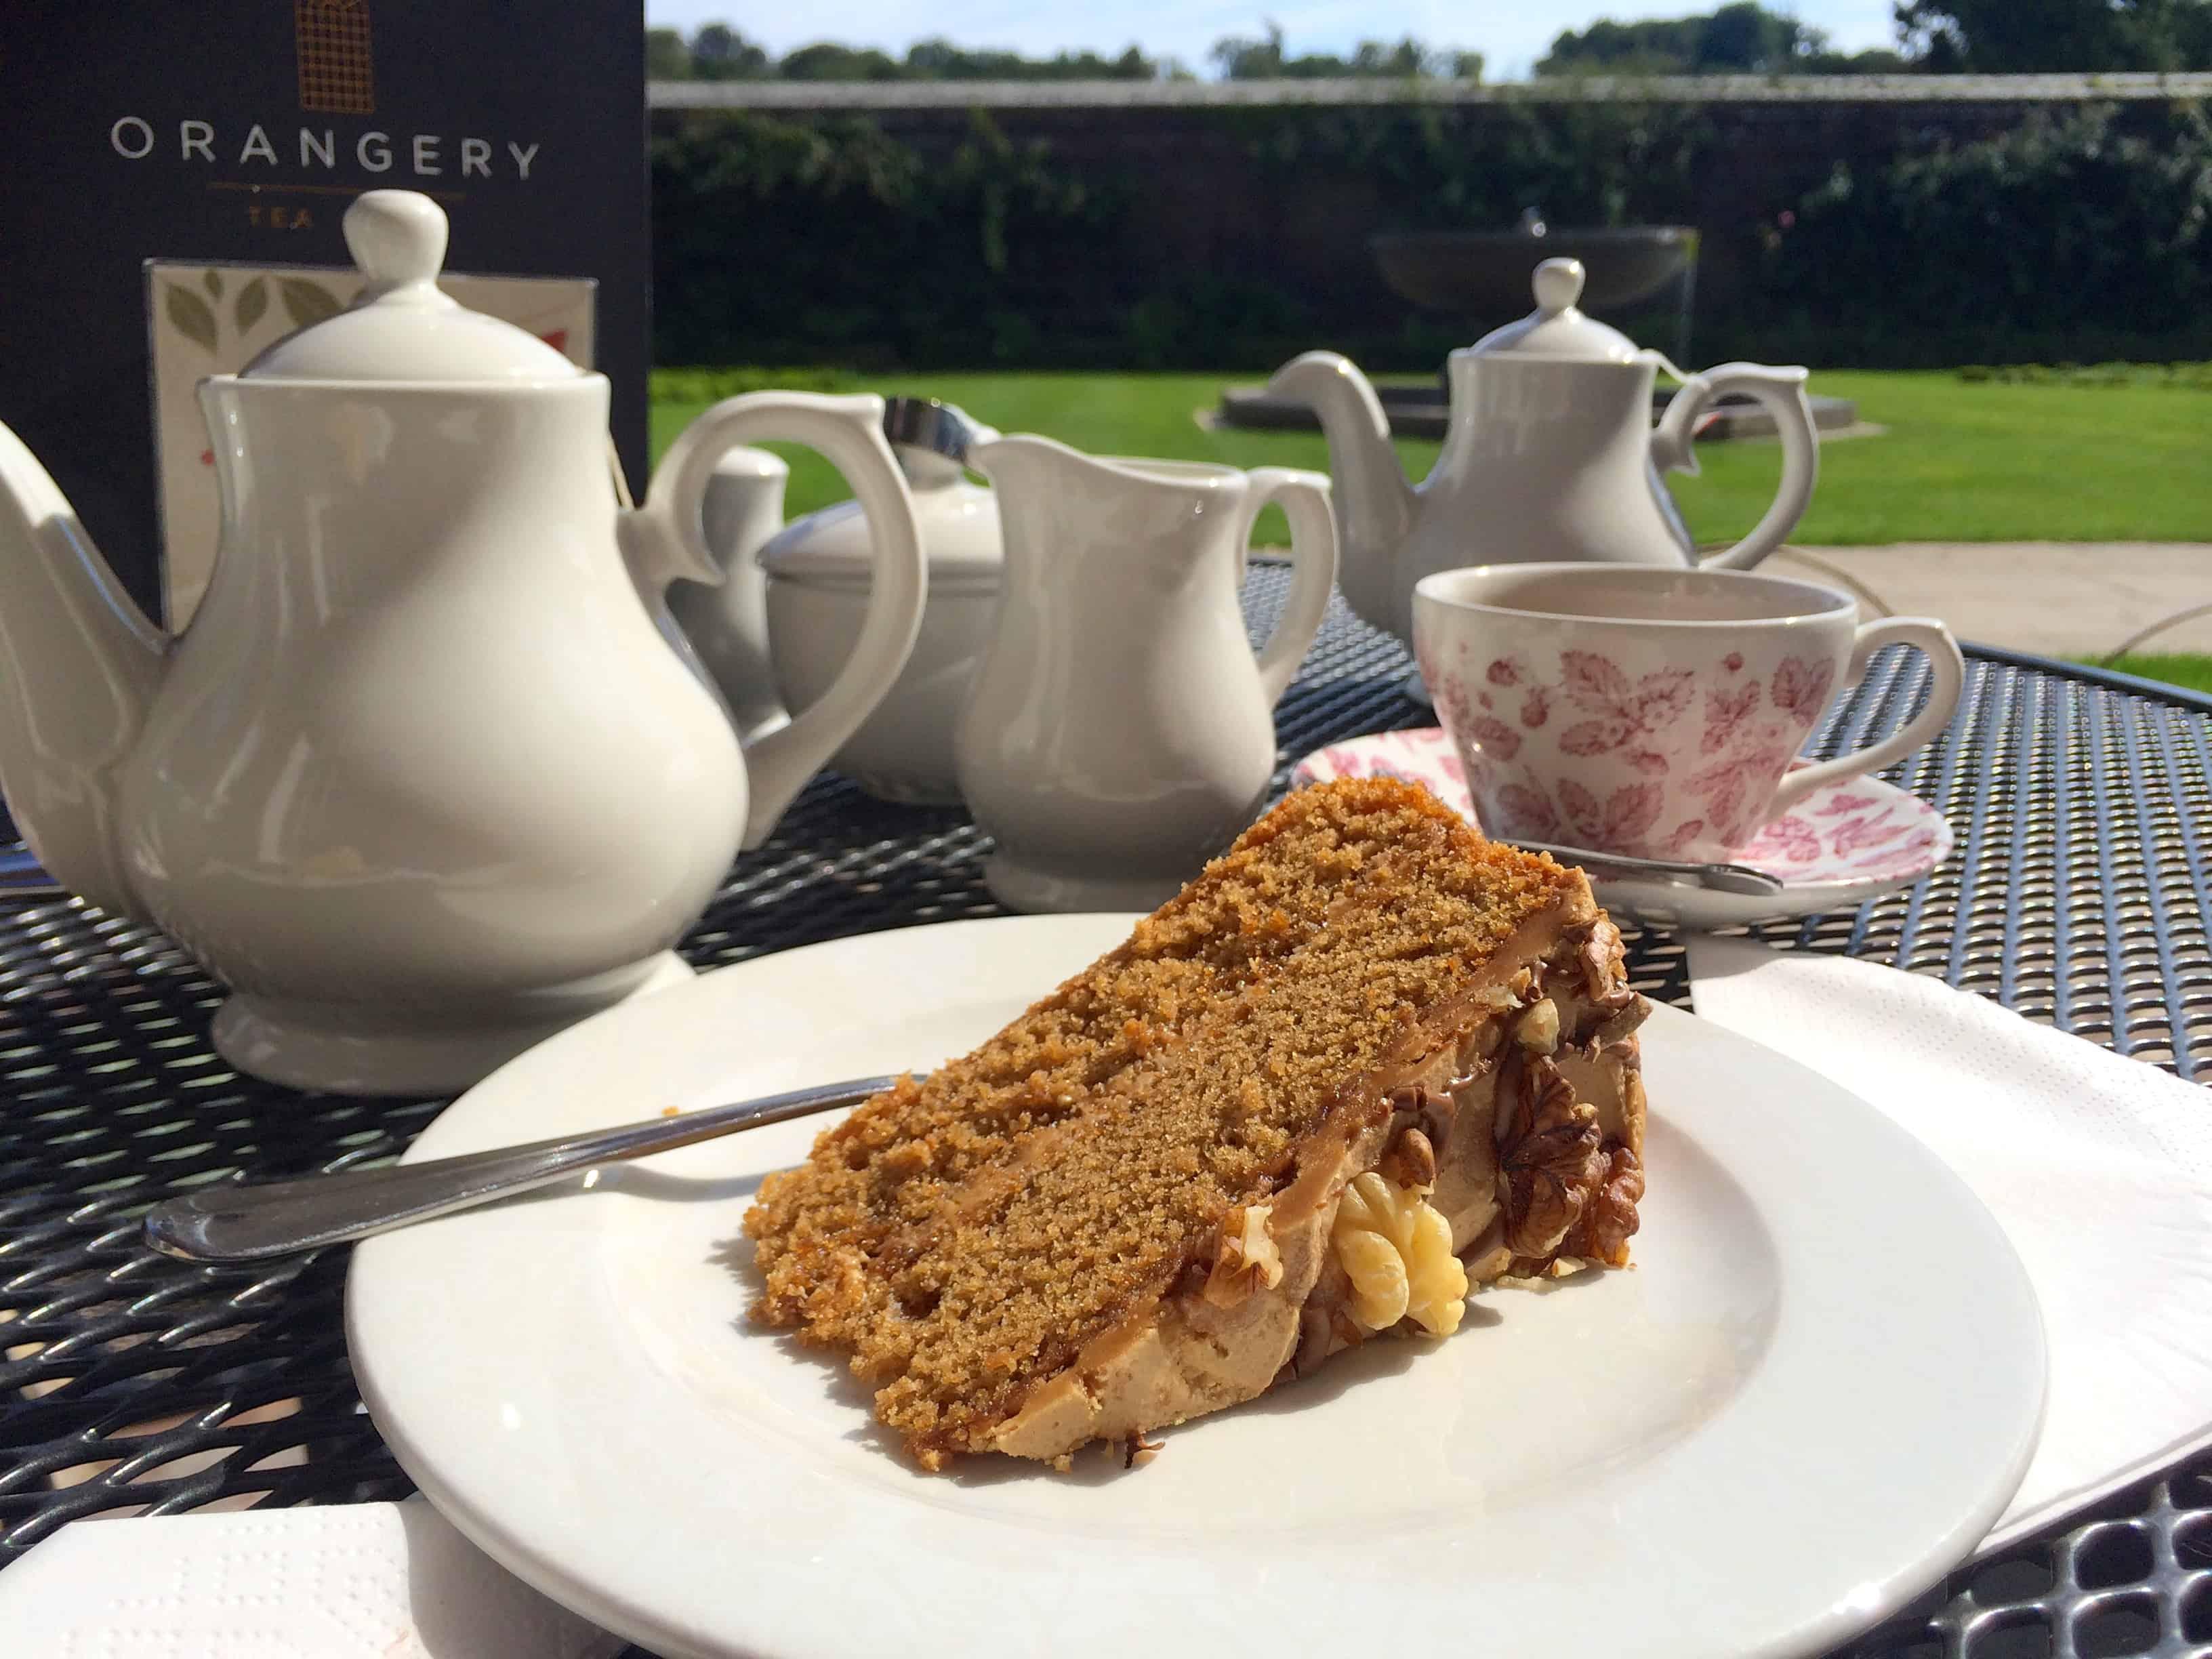 Coffee and Walnut Cake at the Orangery Tea Room